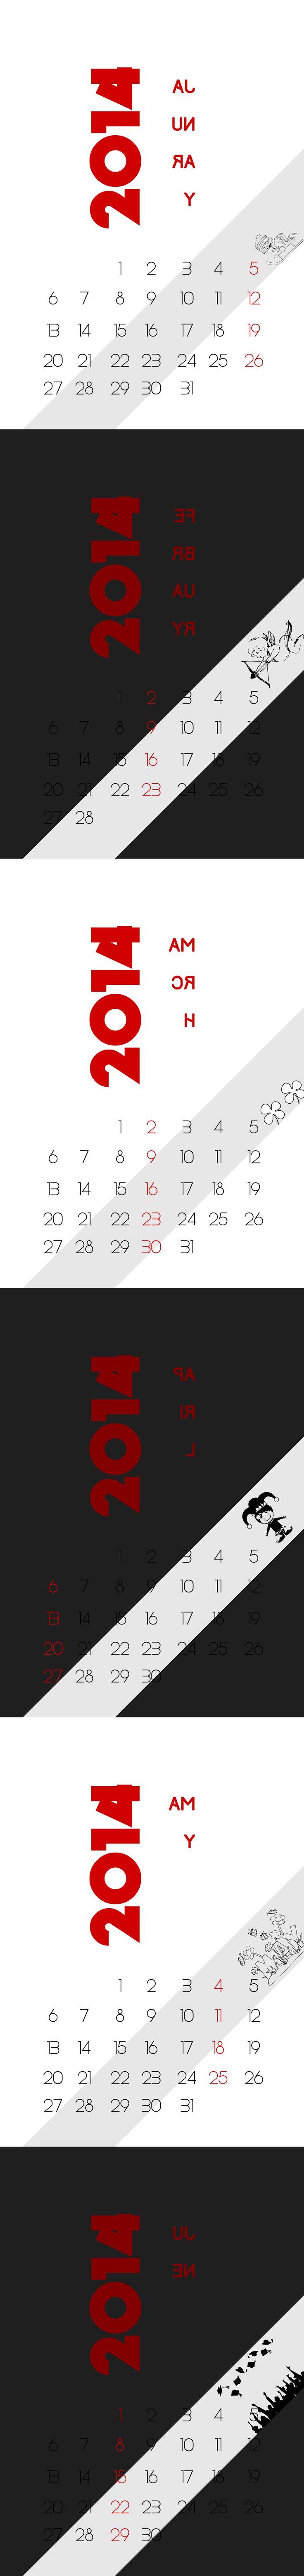 Calendar 2014 - part 1 Hope you Pint it :)